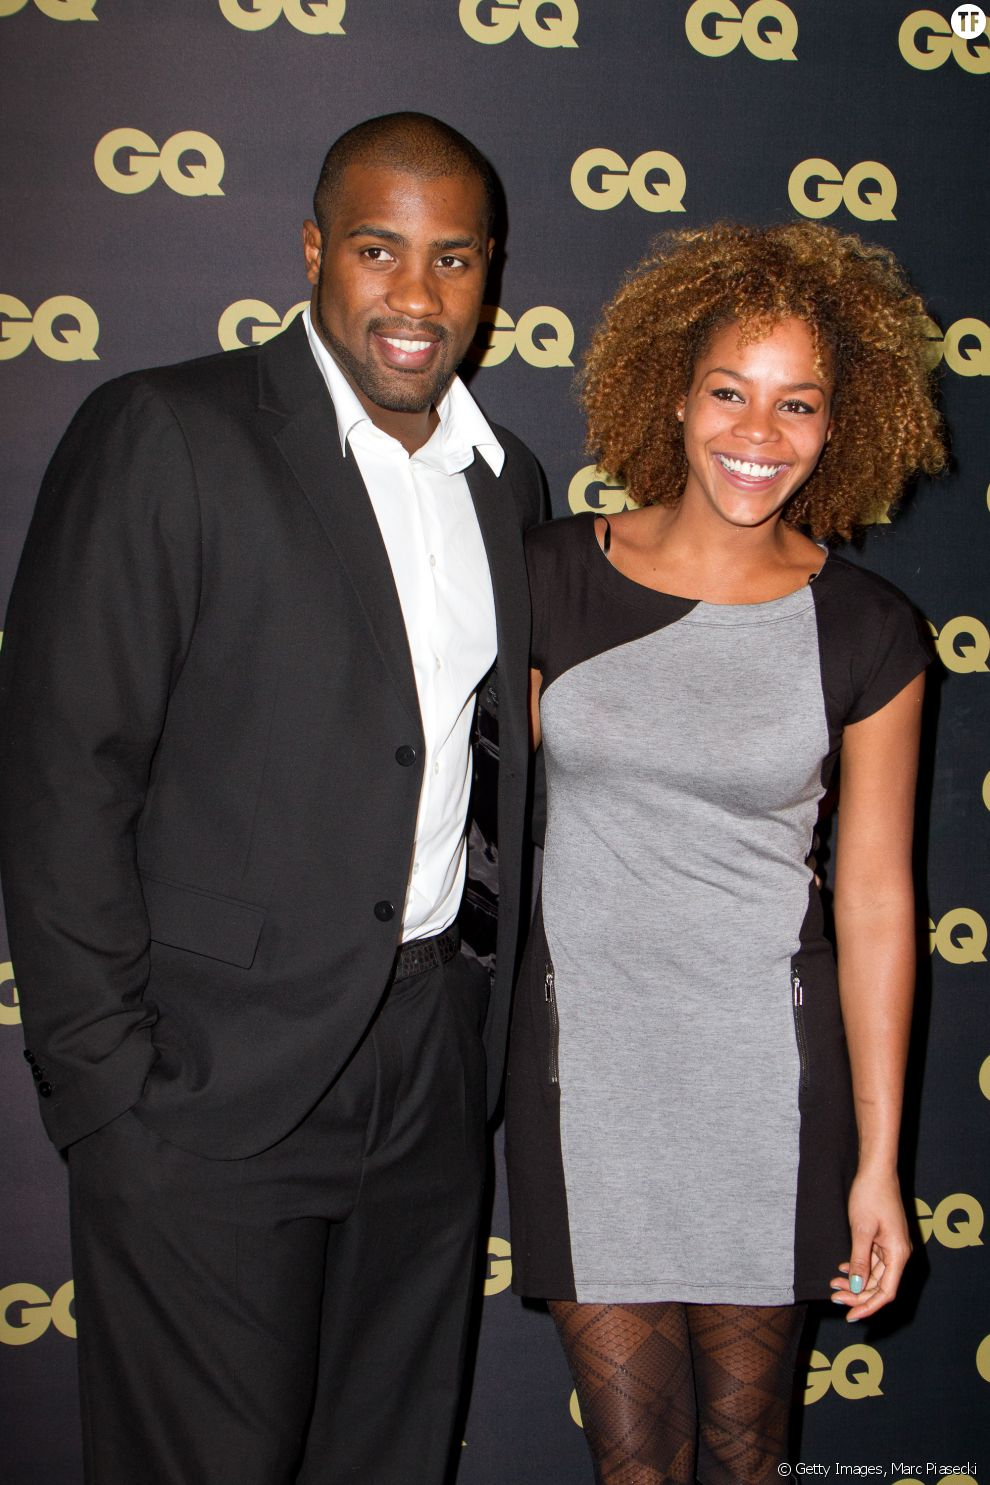 Le judoka français Teddy Riner et sa fiancée Luthna